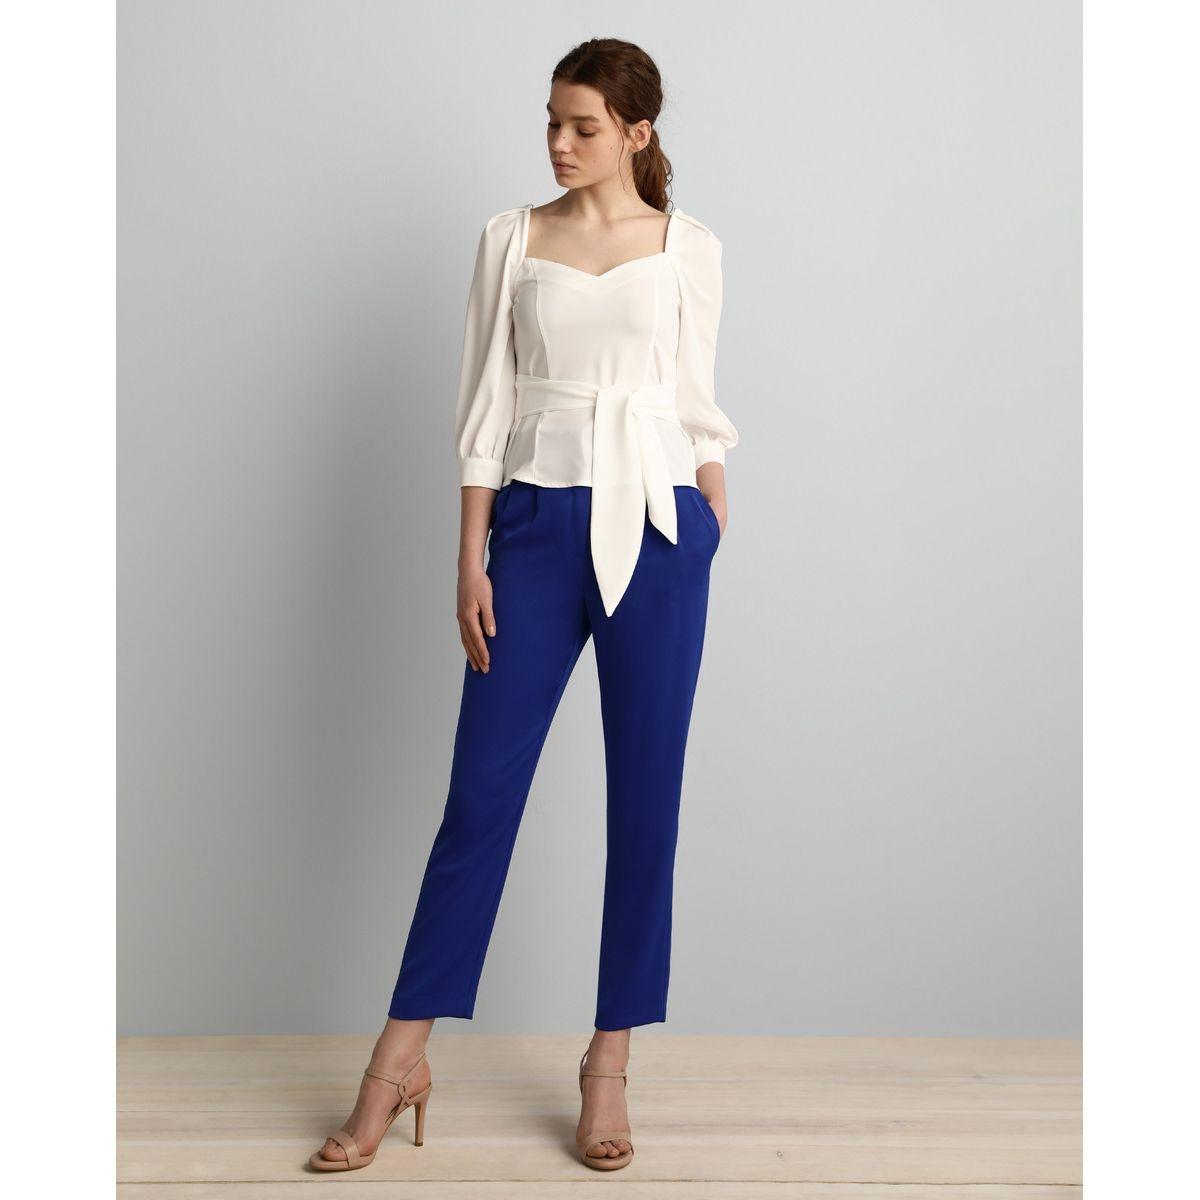 Pantalon fluide avec noeud